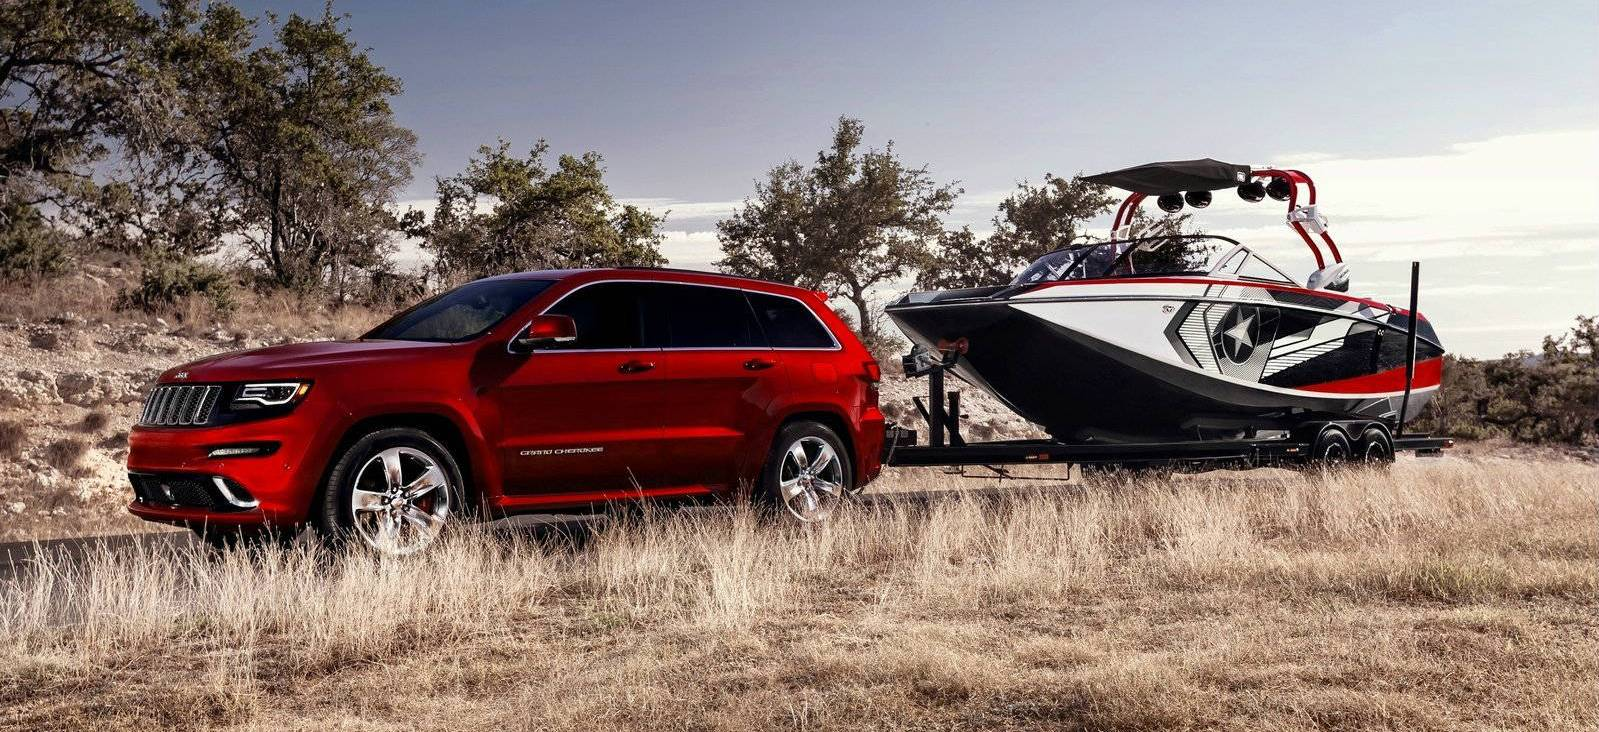 2014 jeep grand cherokee srt no car no fun! muscle cars and power2014 jeep grand cherokee srt